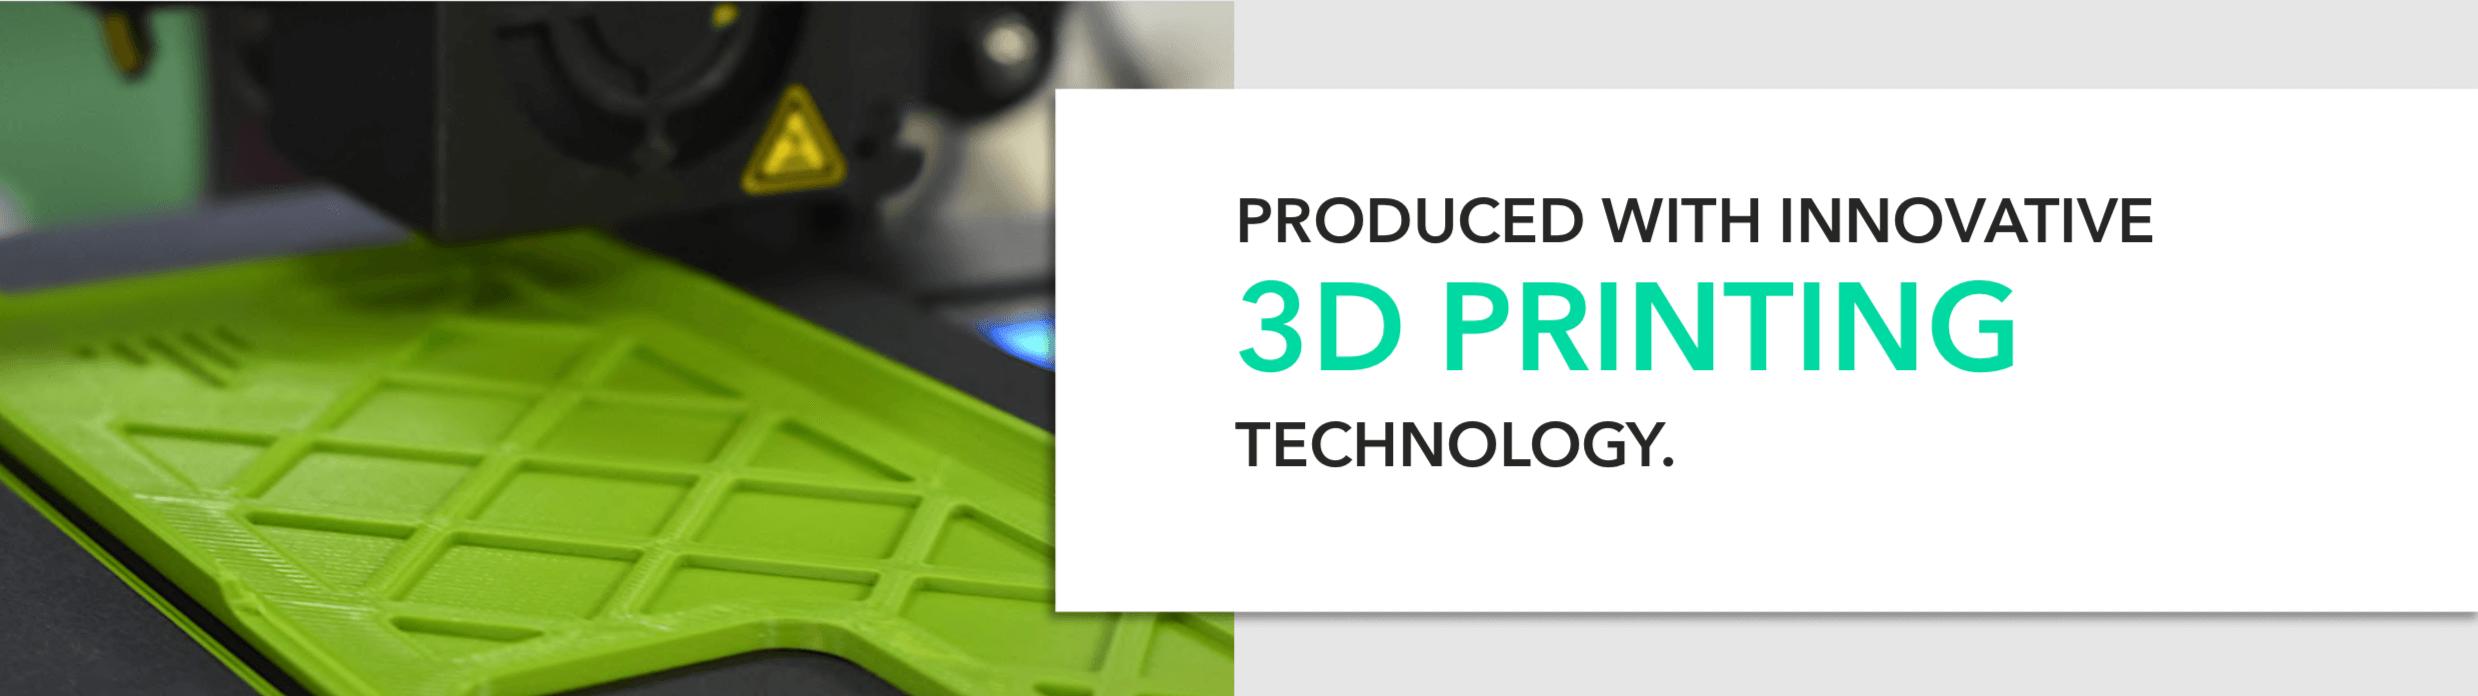 Innovative 3D printing